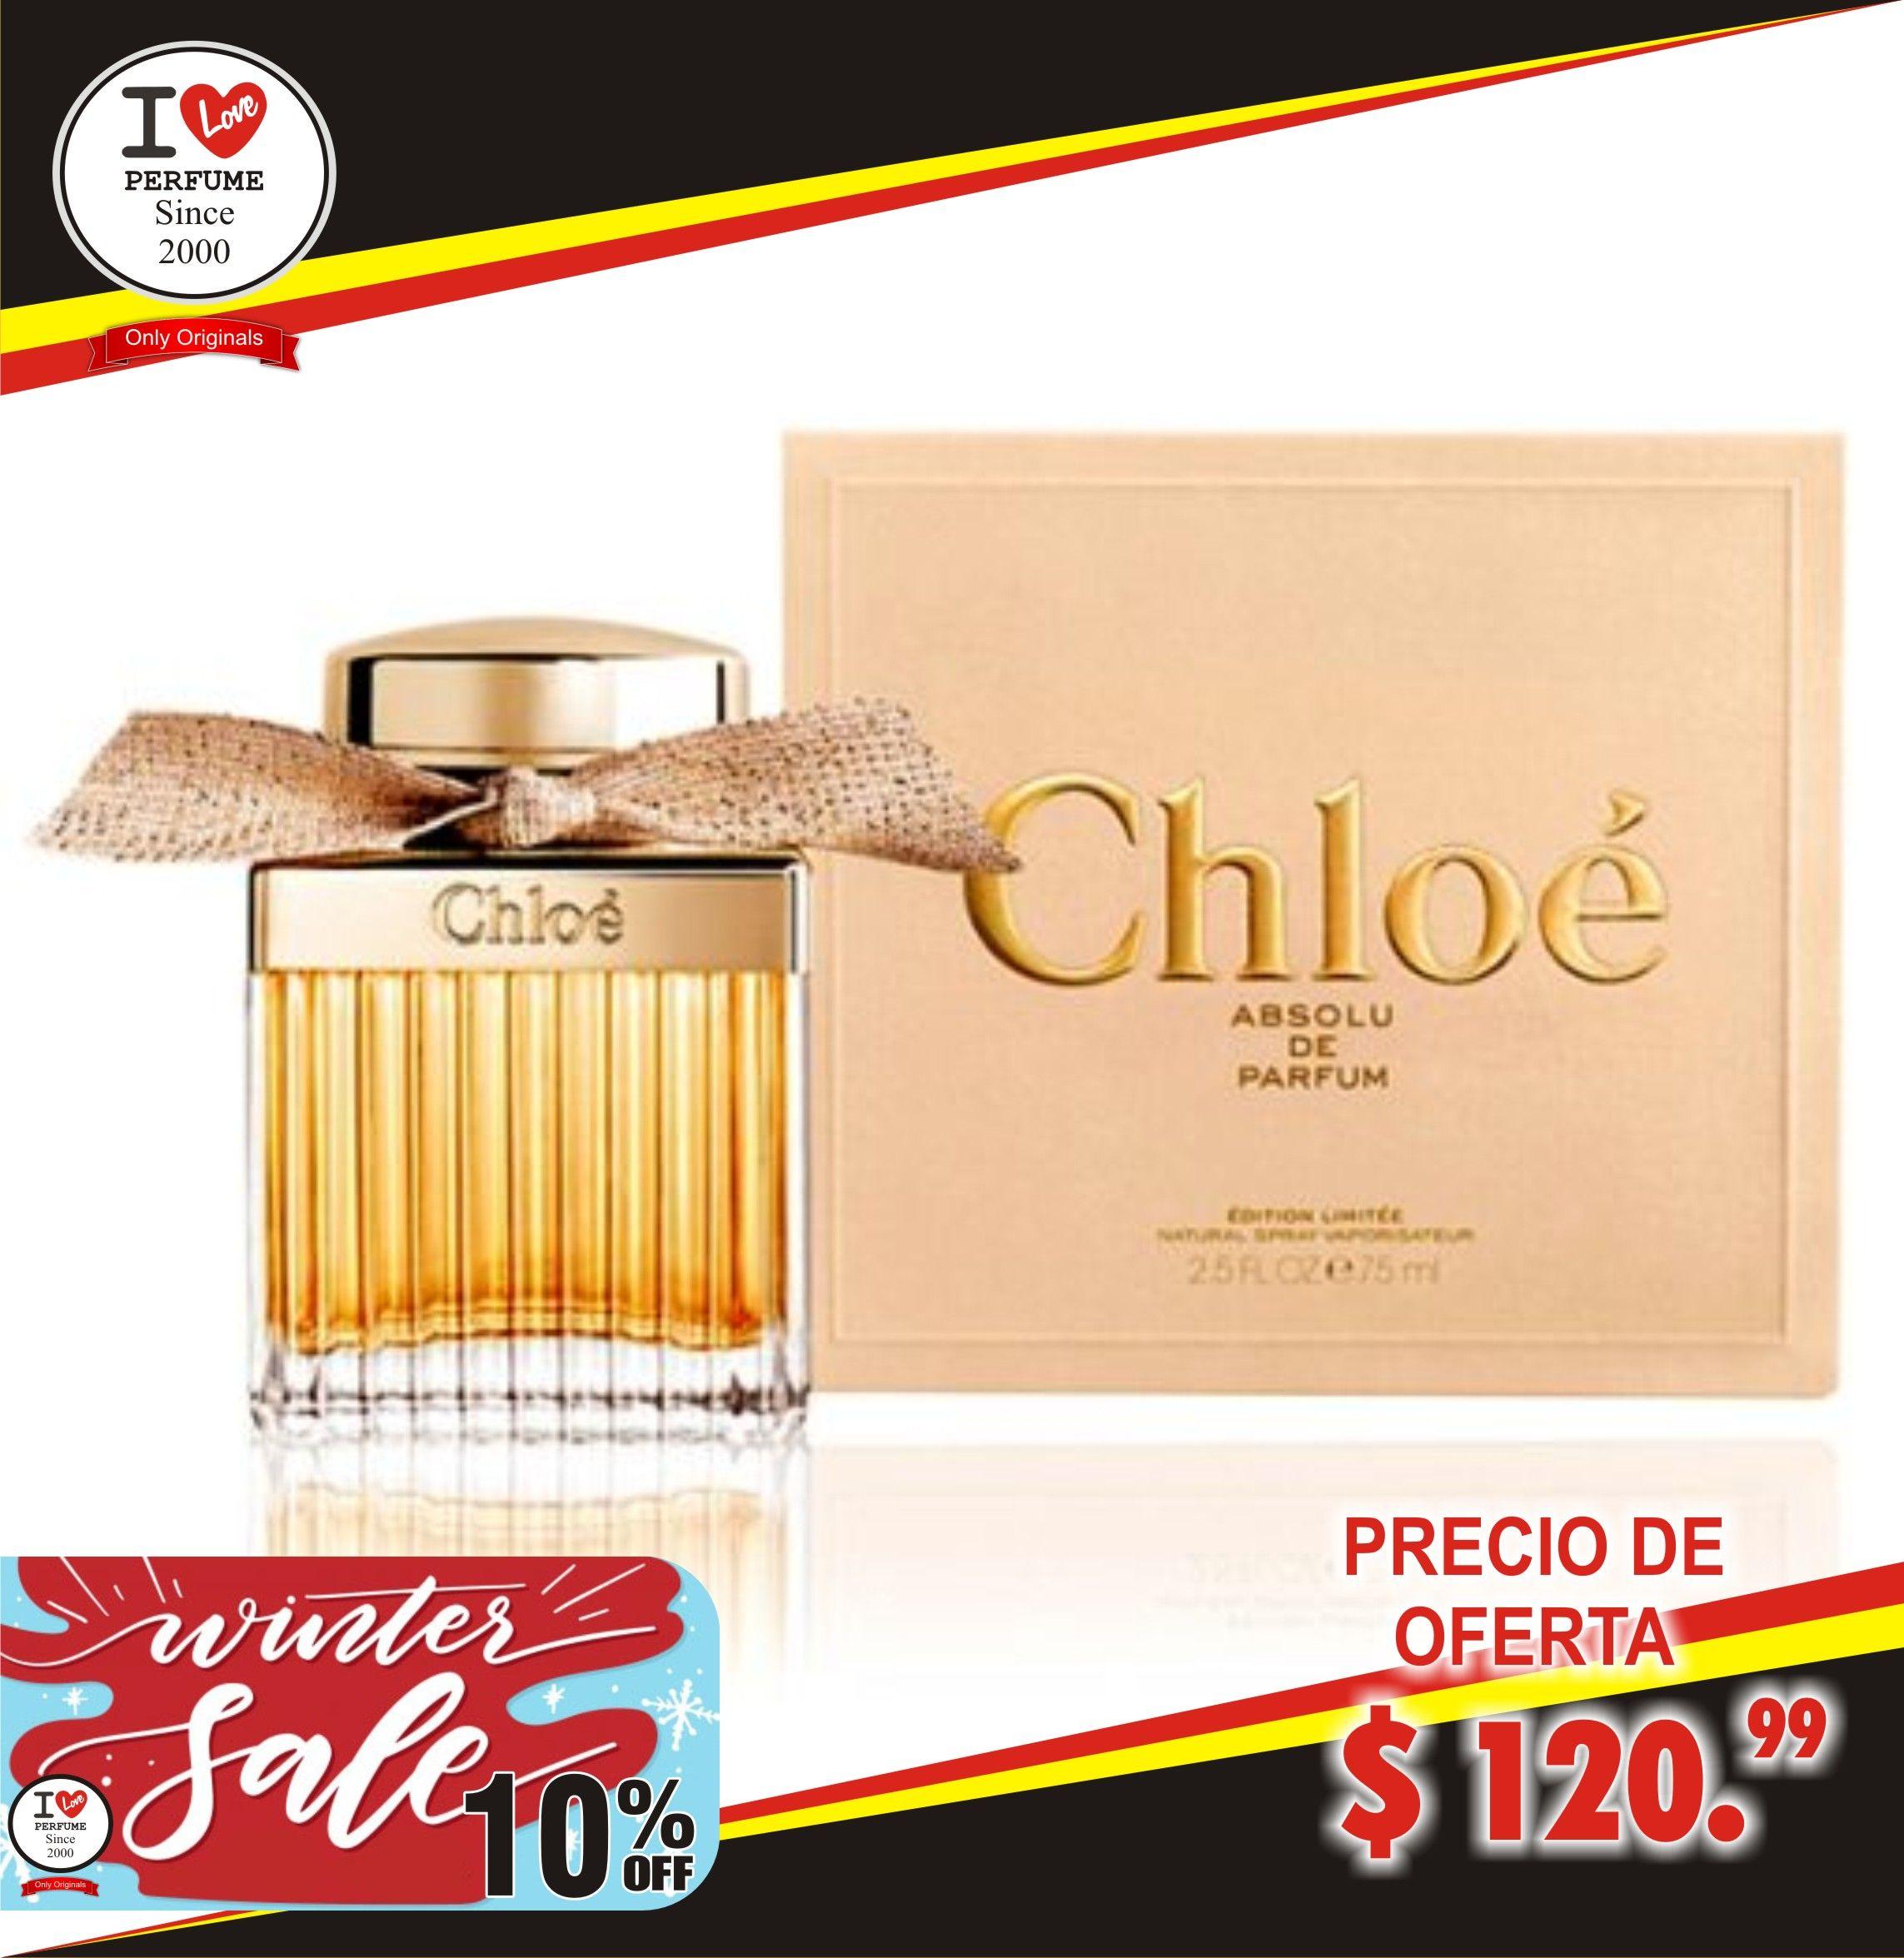 Big Winter Sales Specialdiscounts Tuperfumepreferido Buynow Preciosincreibles Visit Our Business Website And Buy You Perfume Eau De Parfum Perfume Bottles